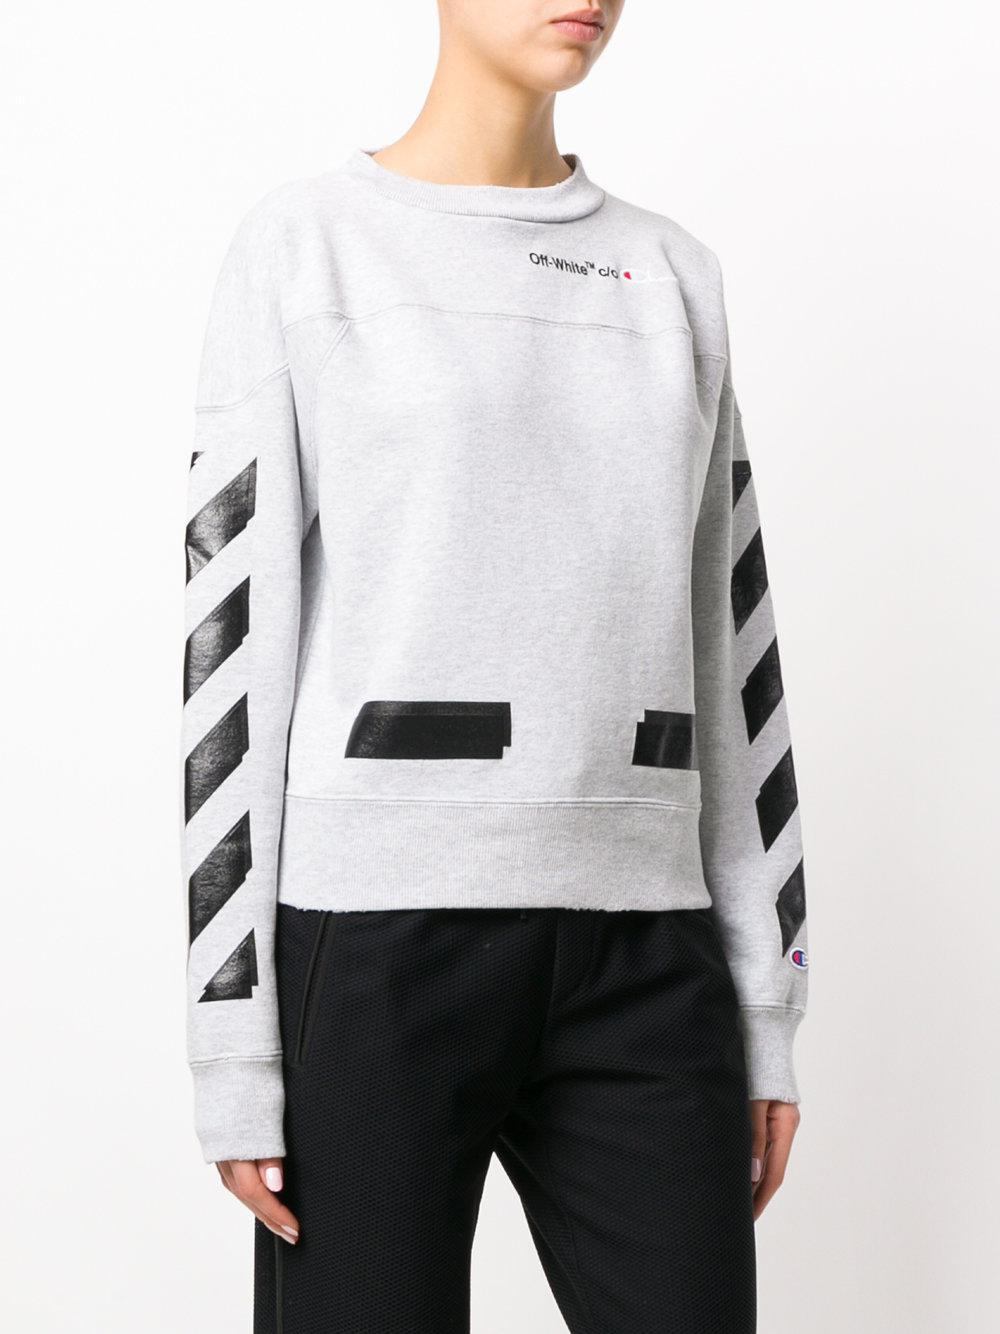 lyst off white c o virgil abloh arrows champion sweatshirt in gray. Black Bedroom Furniture Sets. Home Design Ideas